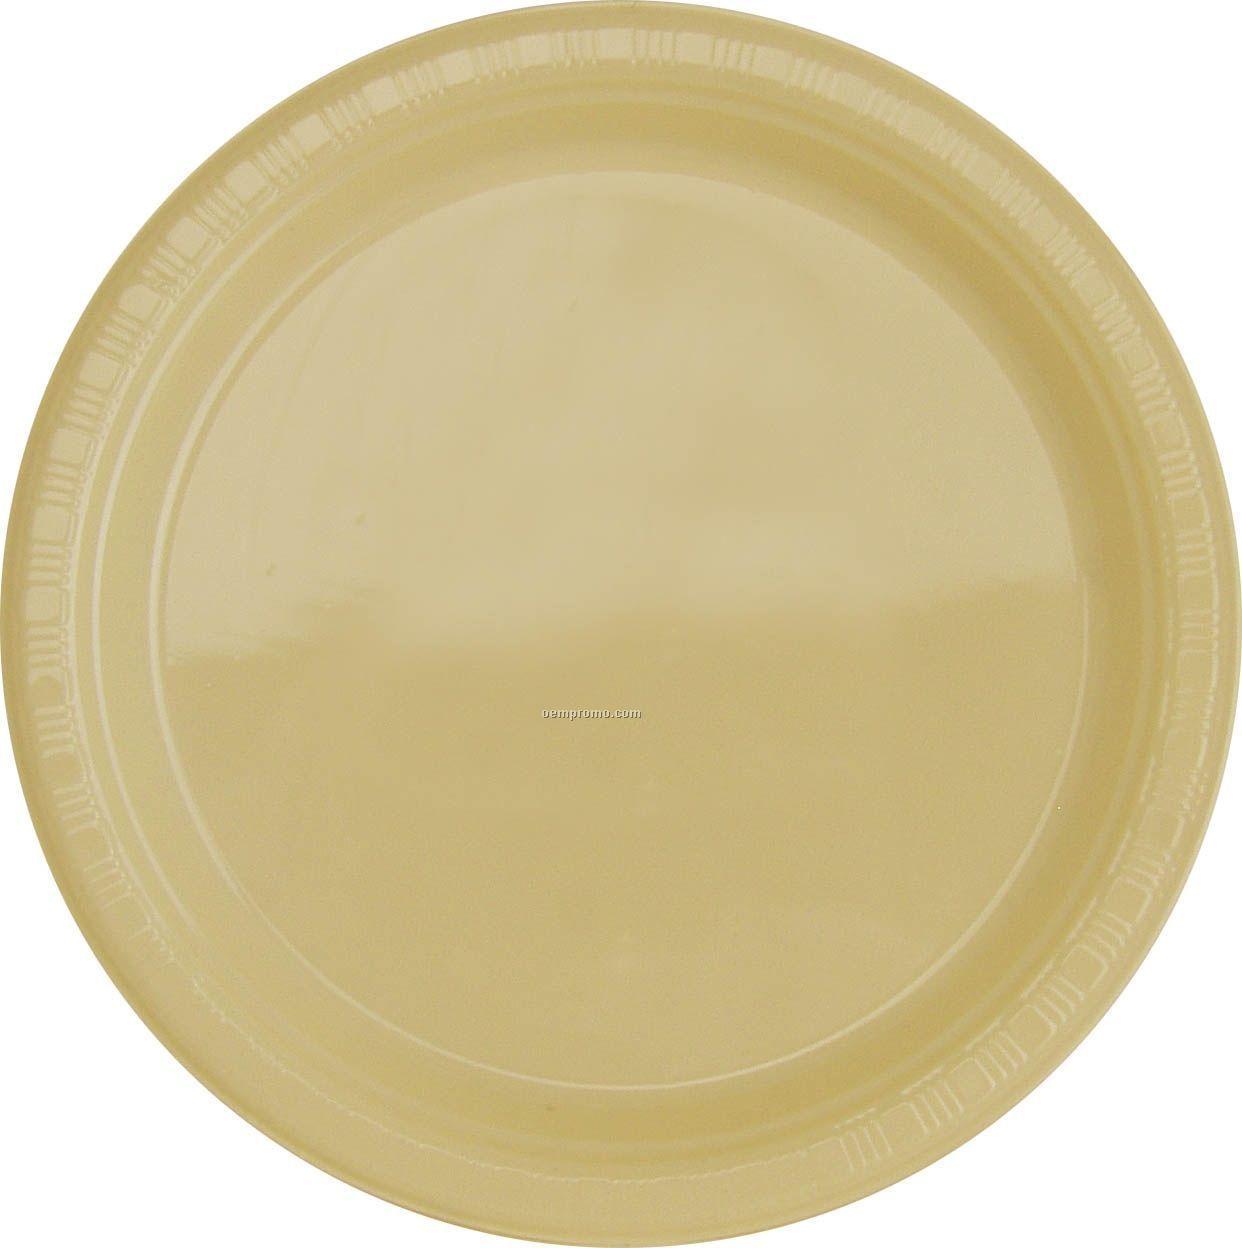 "Colorware 7"" Ivory White Plastic Plate"